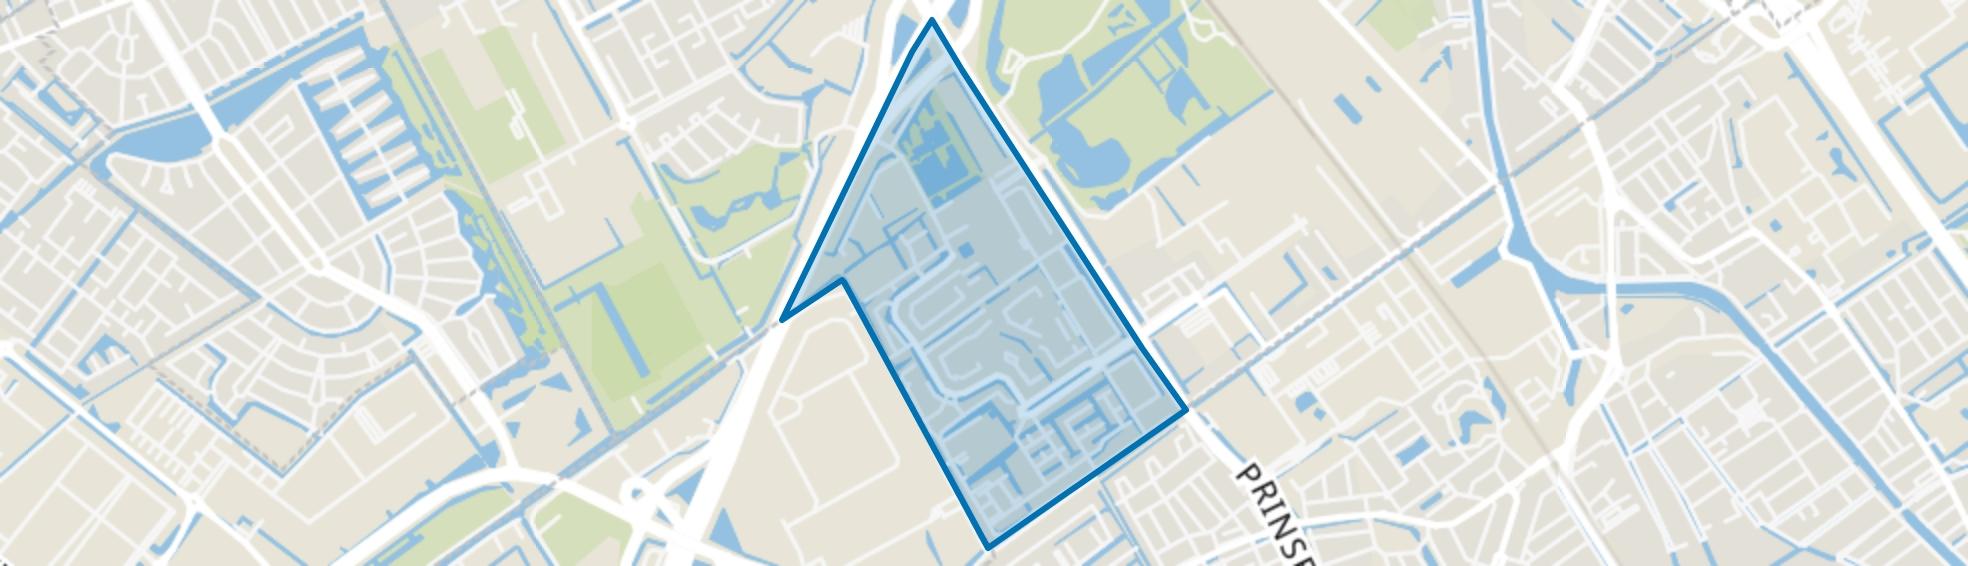 Sion, Rijswijk (ZH) map